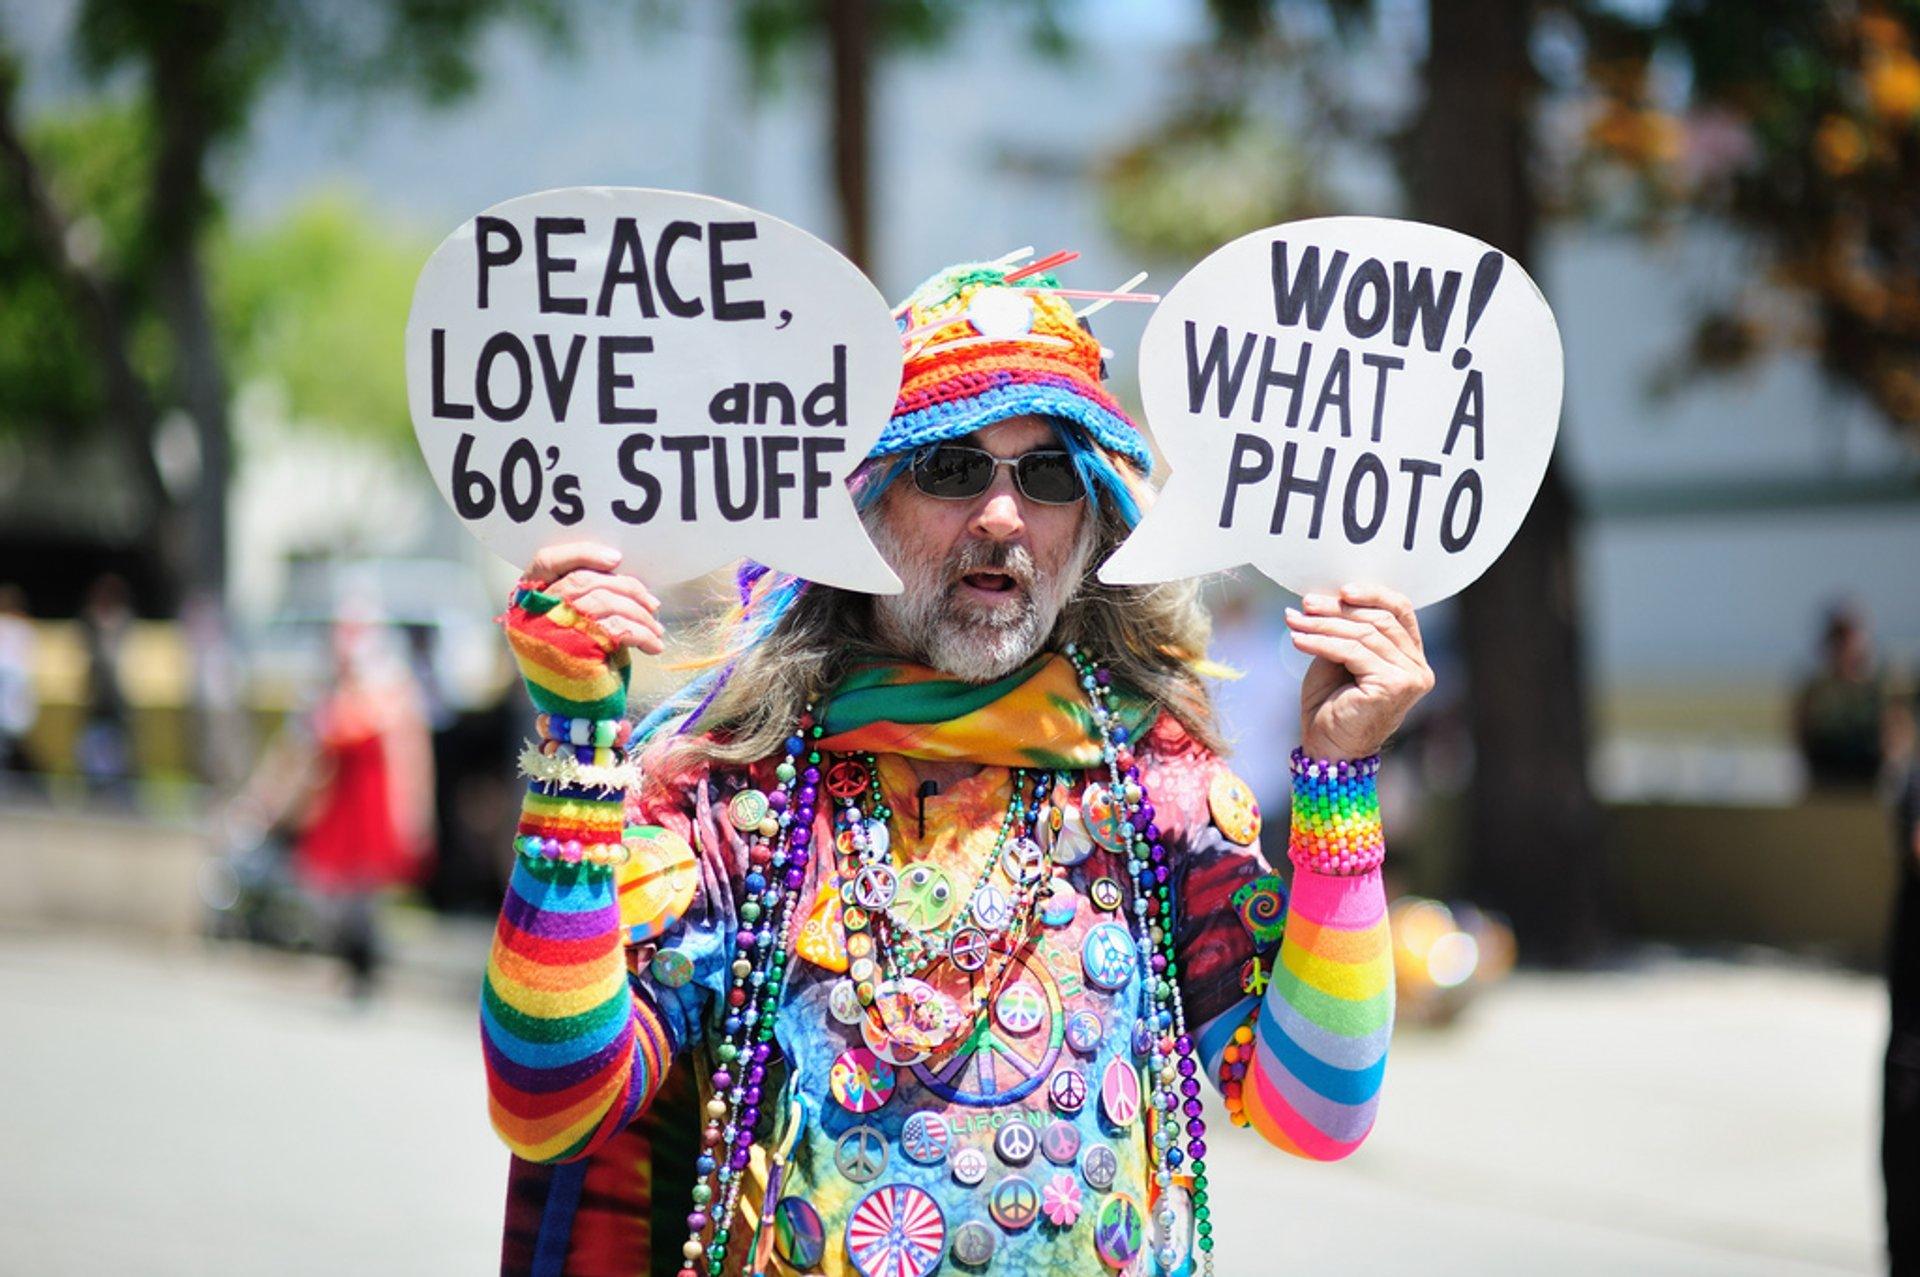 Pasadena Doo Dah Parade in Los Angeles 2019 - Best Time